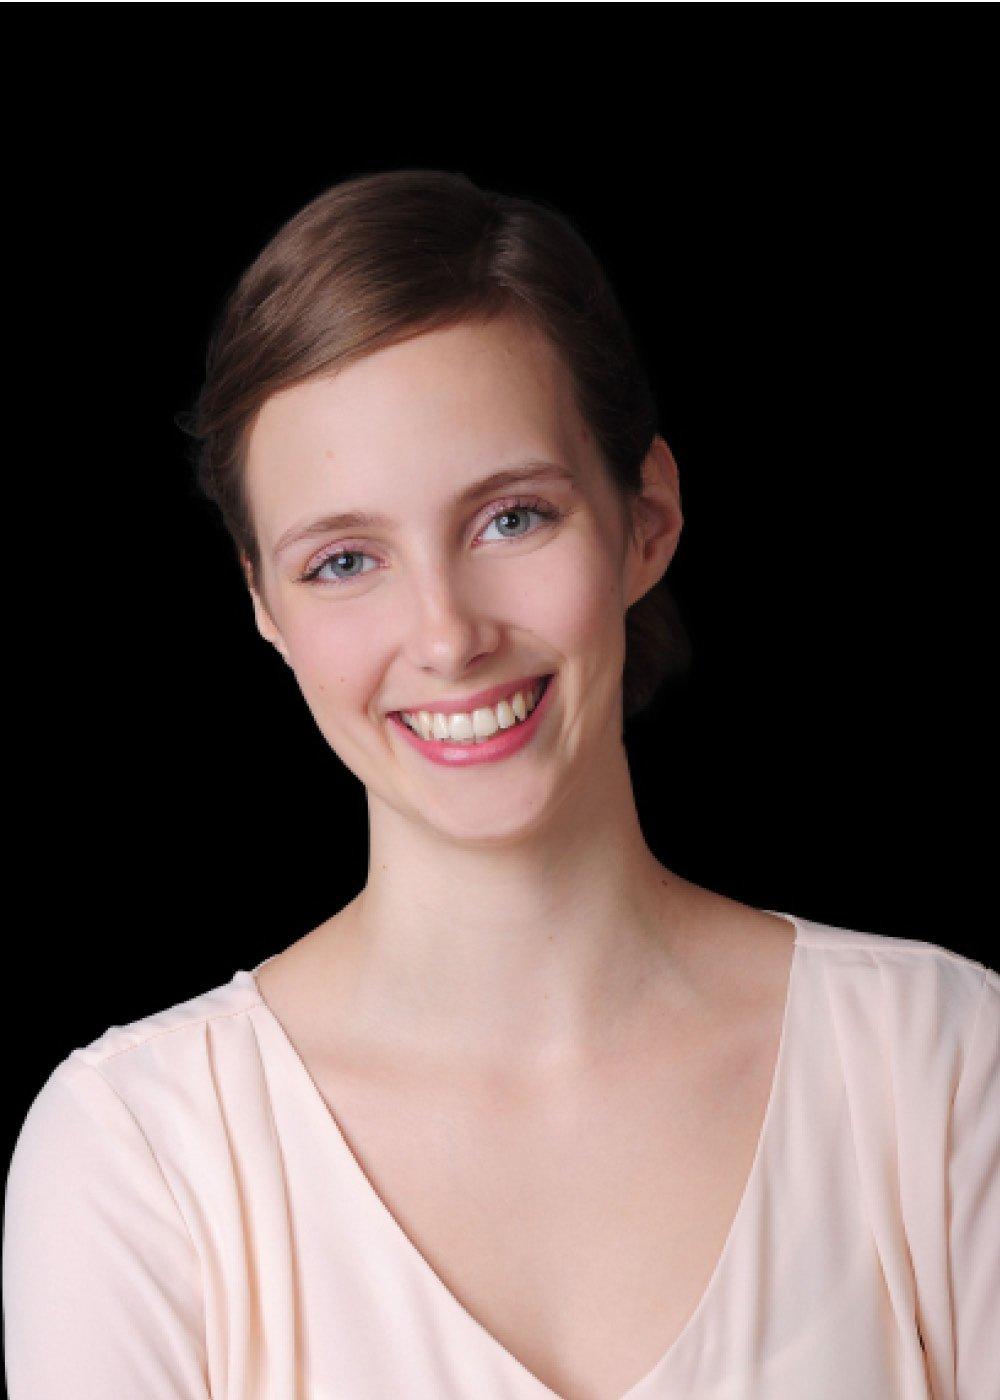 Carlotta Sunderland